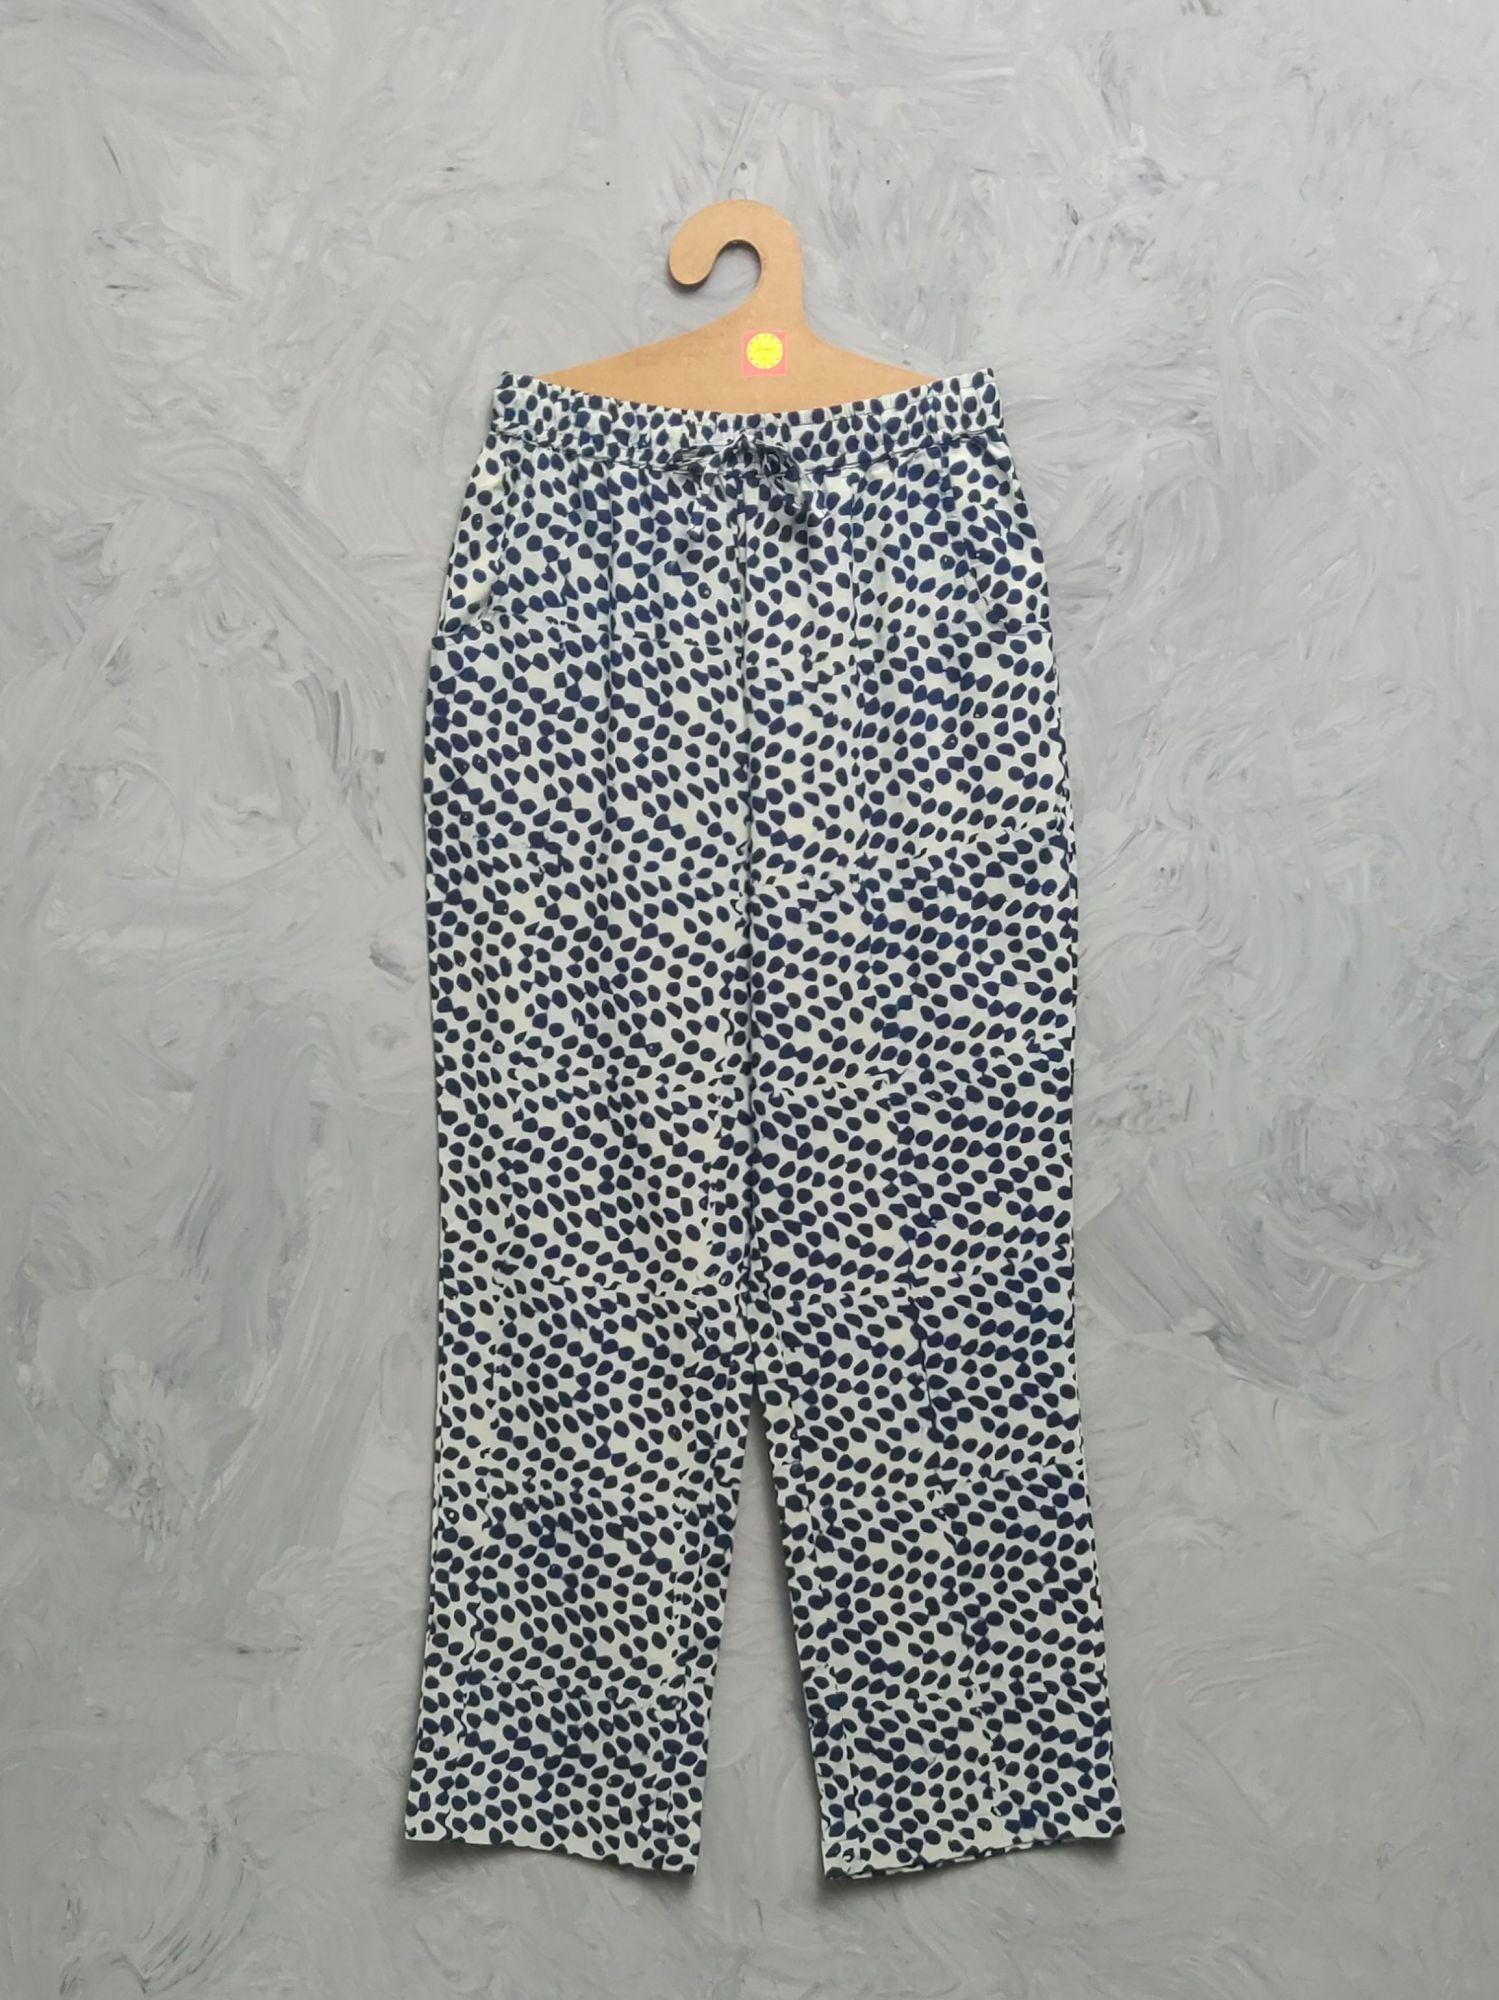 Indigo Cotton Handblock Print Night Suits WNS477